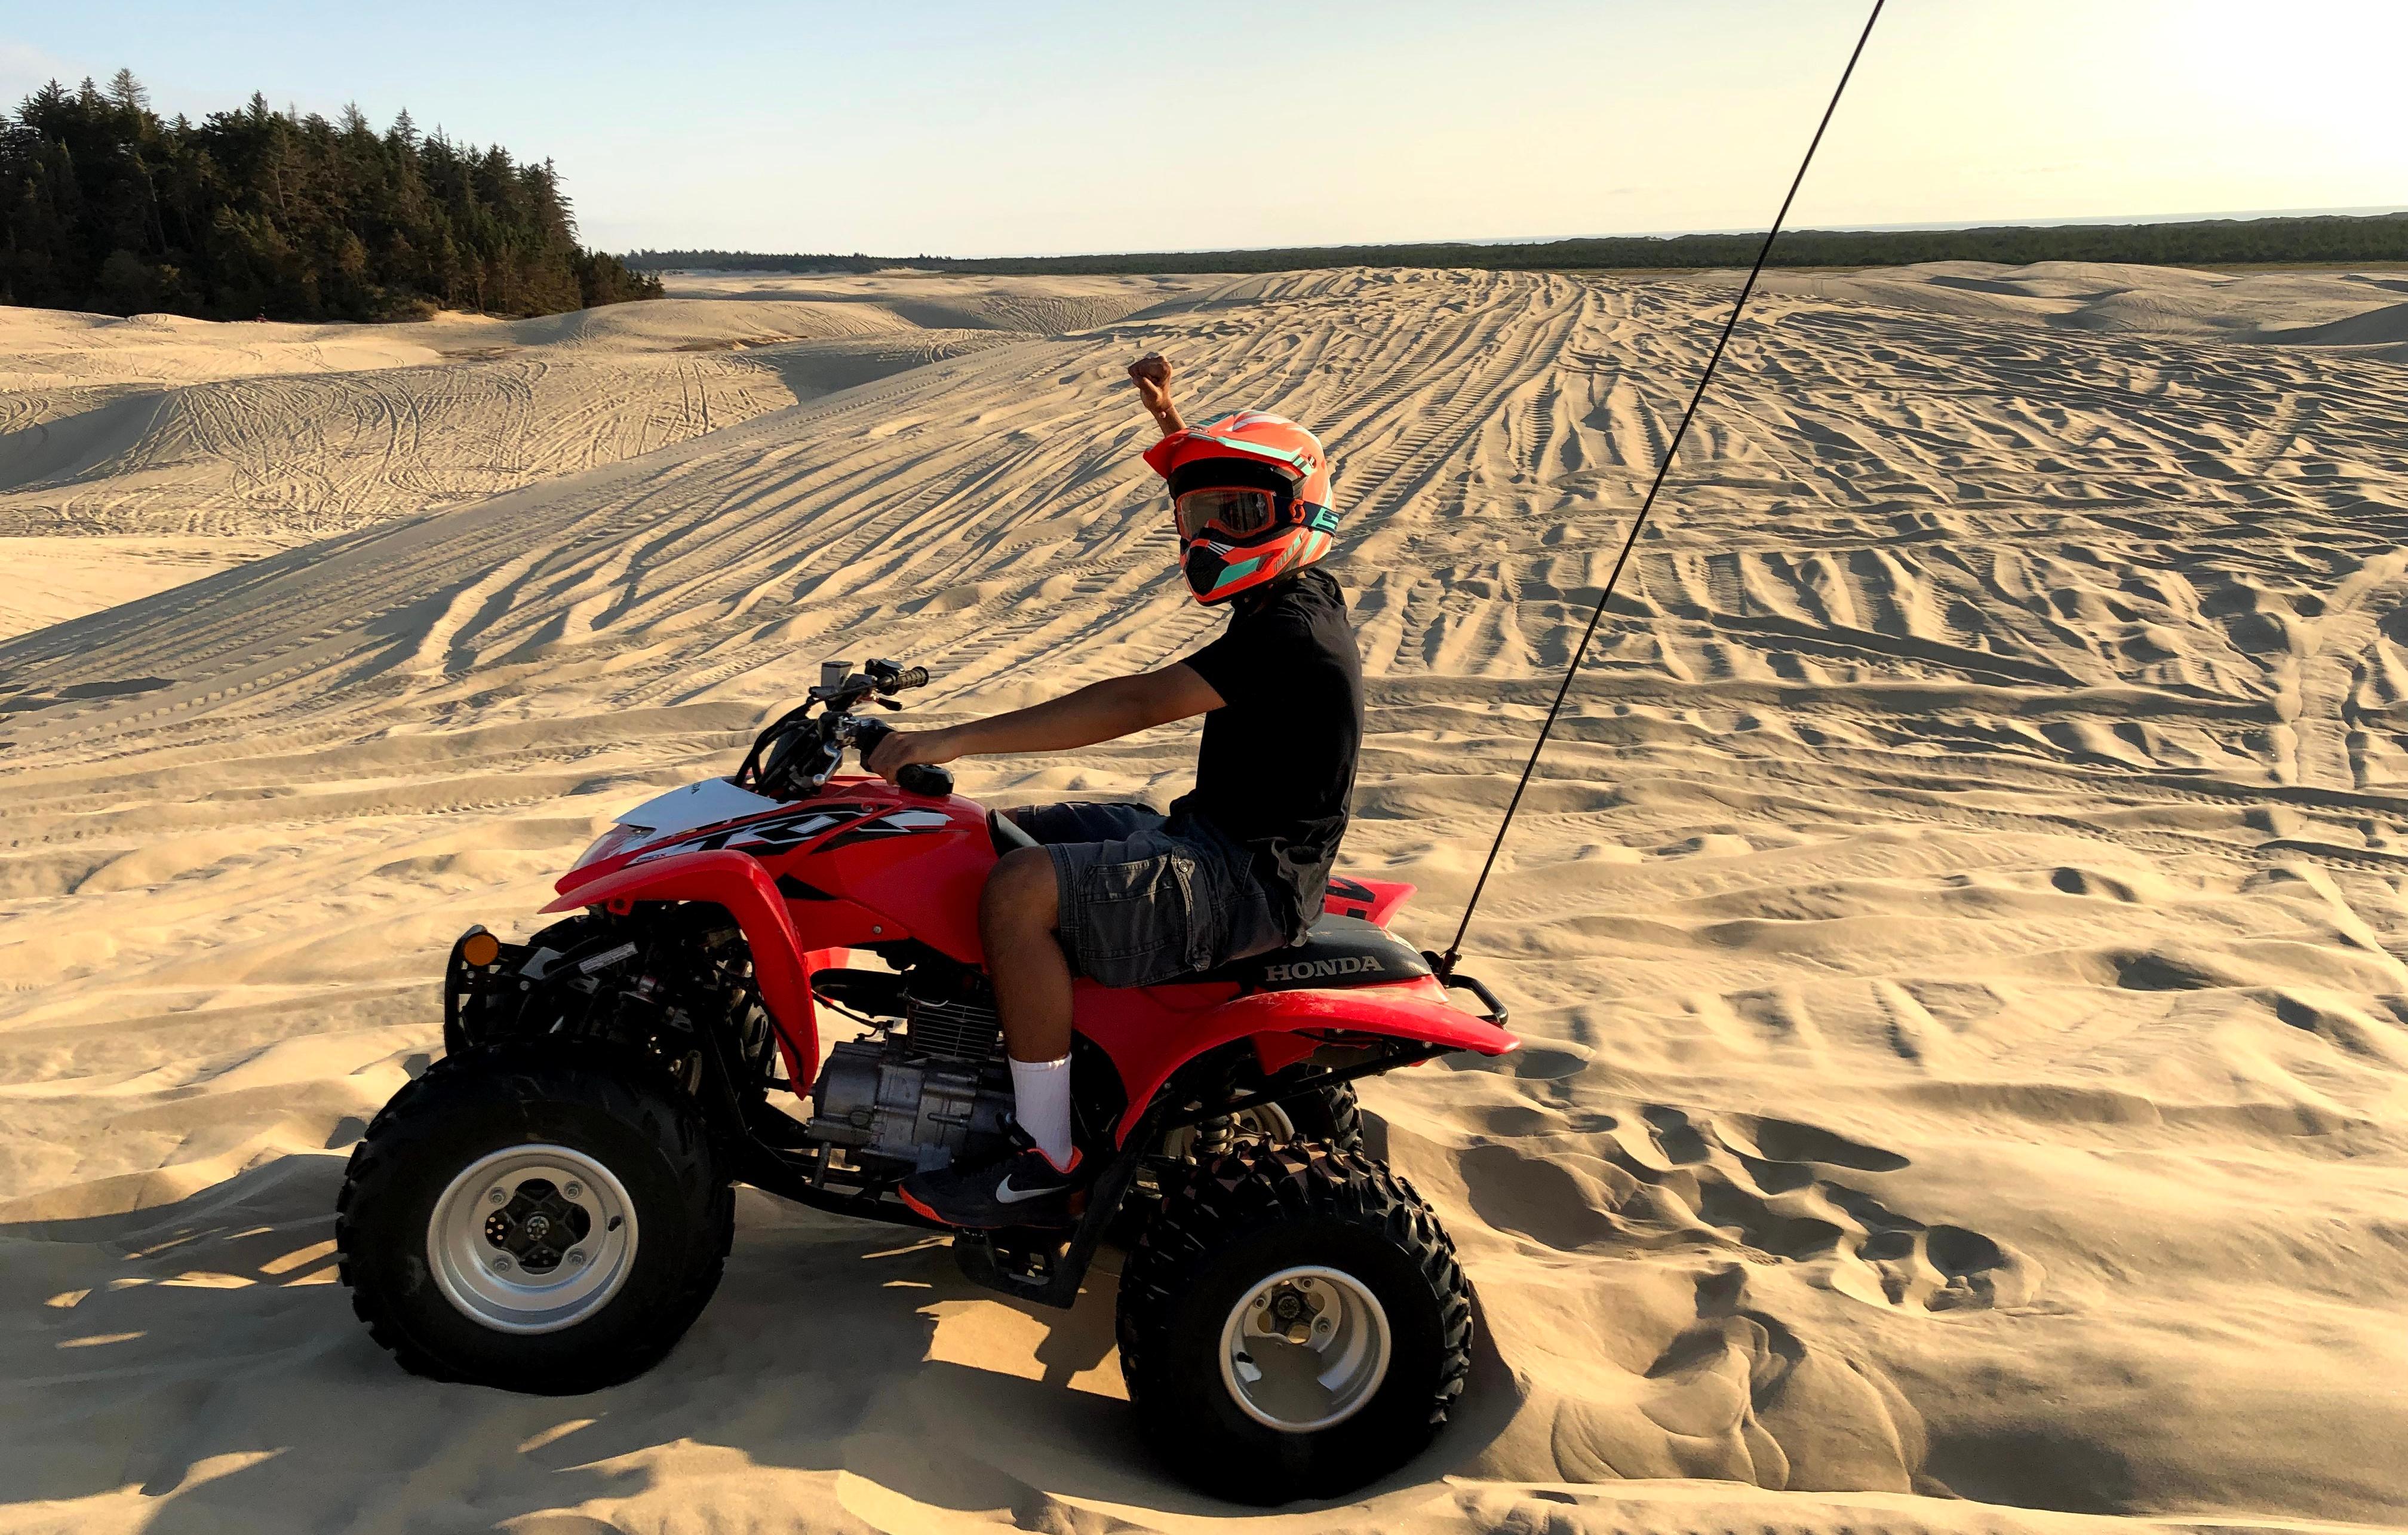 Sandboarding and Dunes Riding